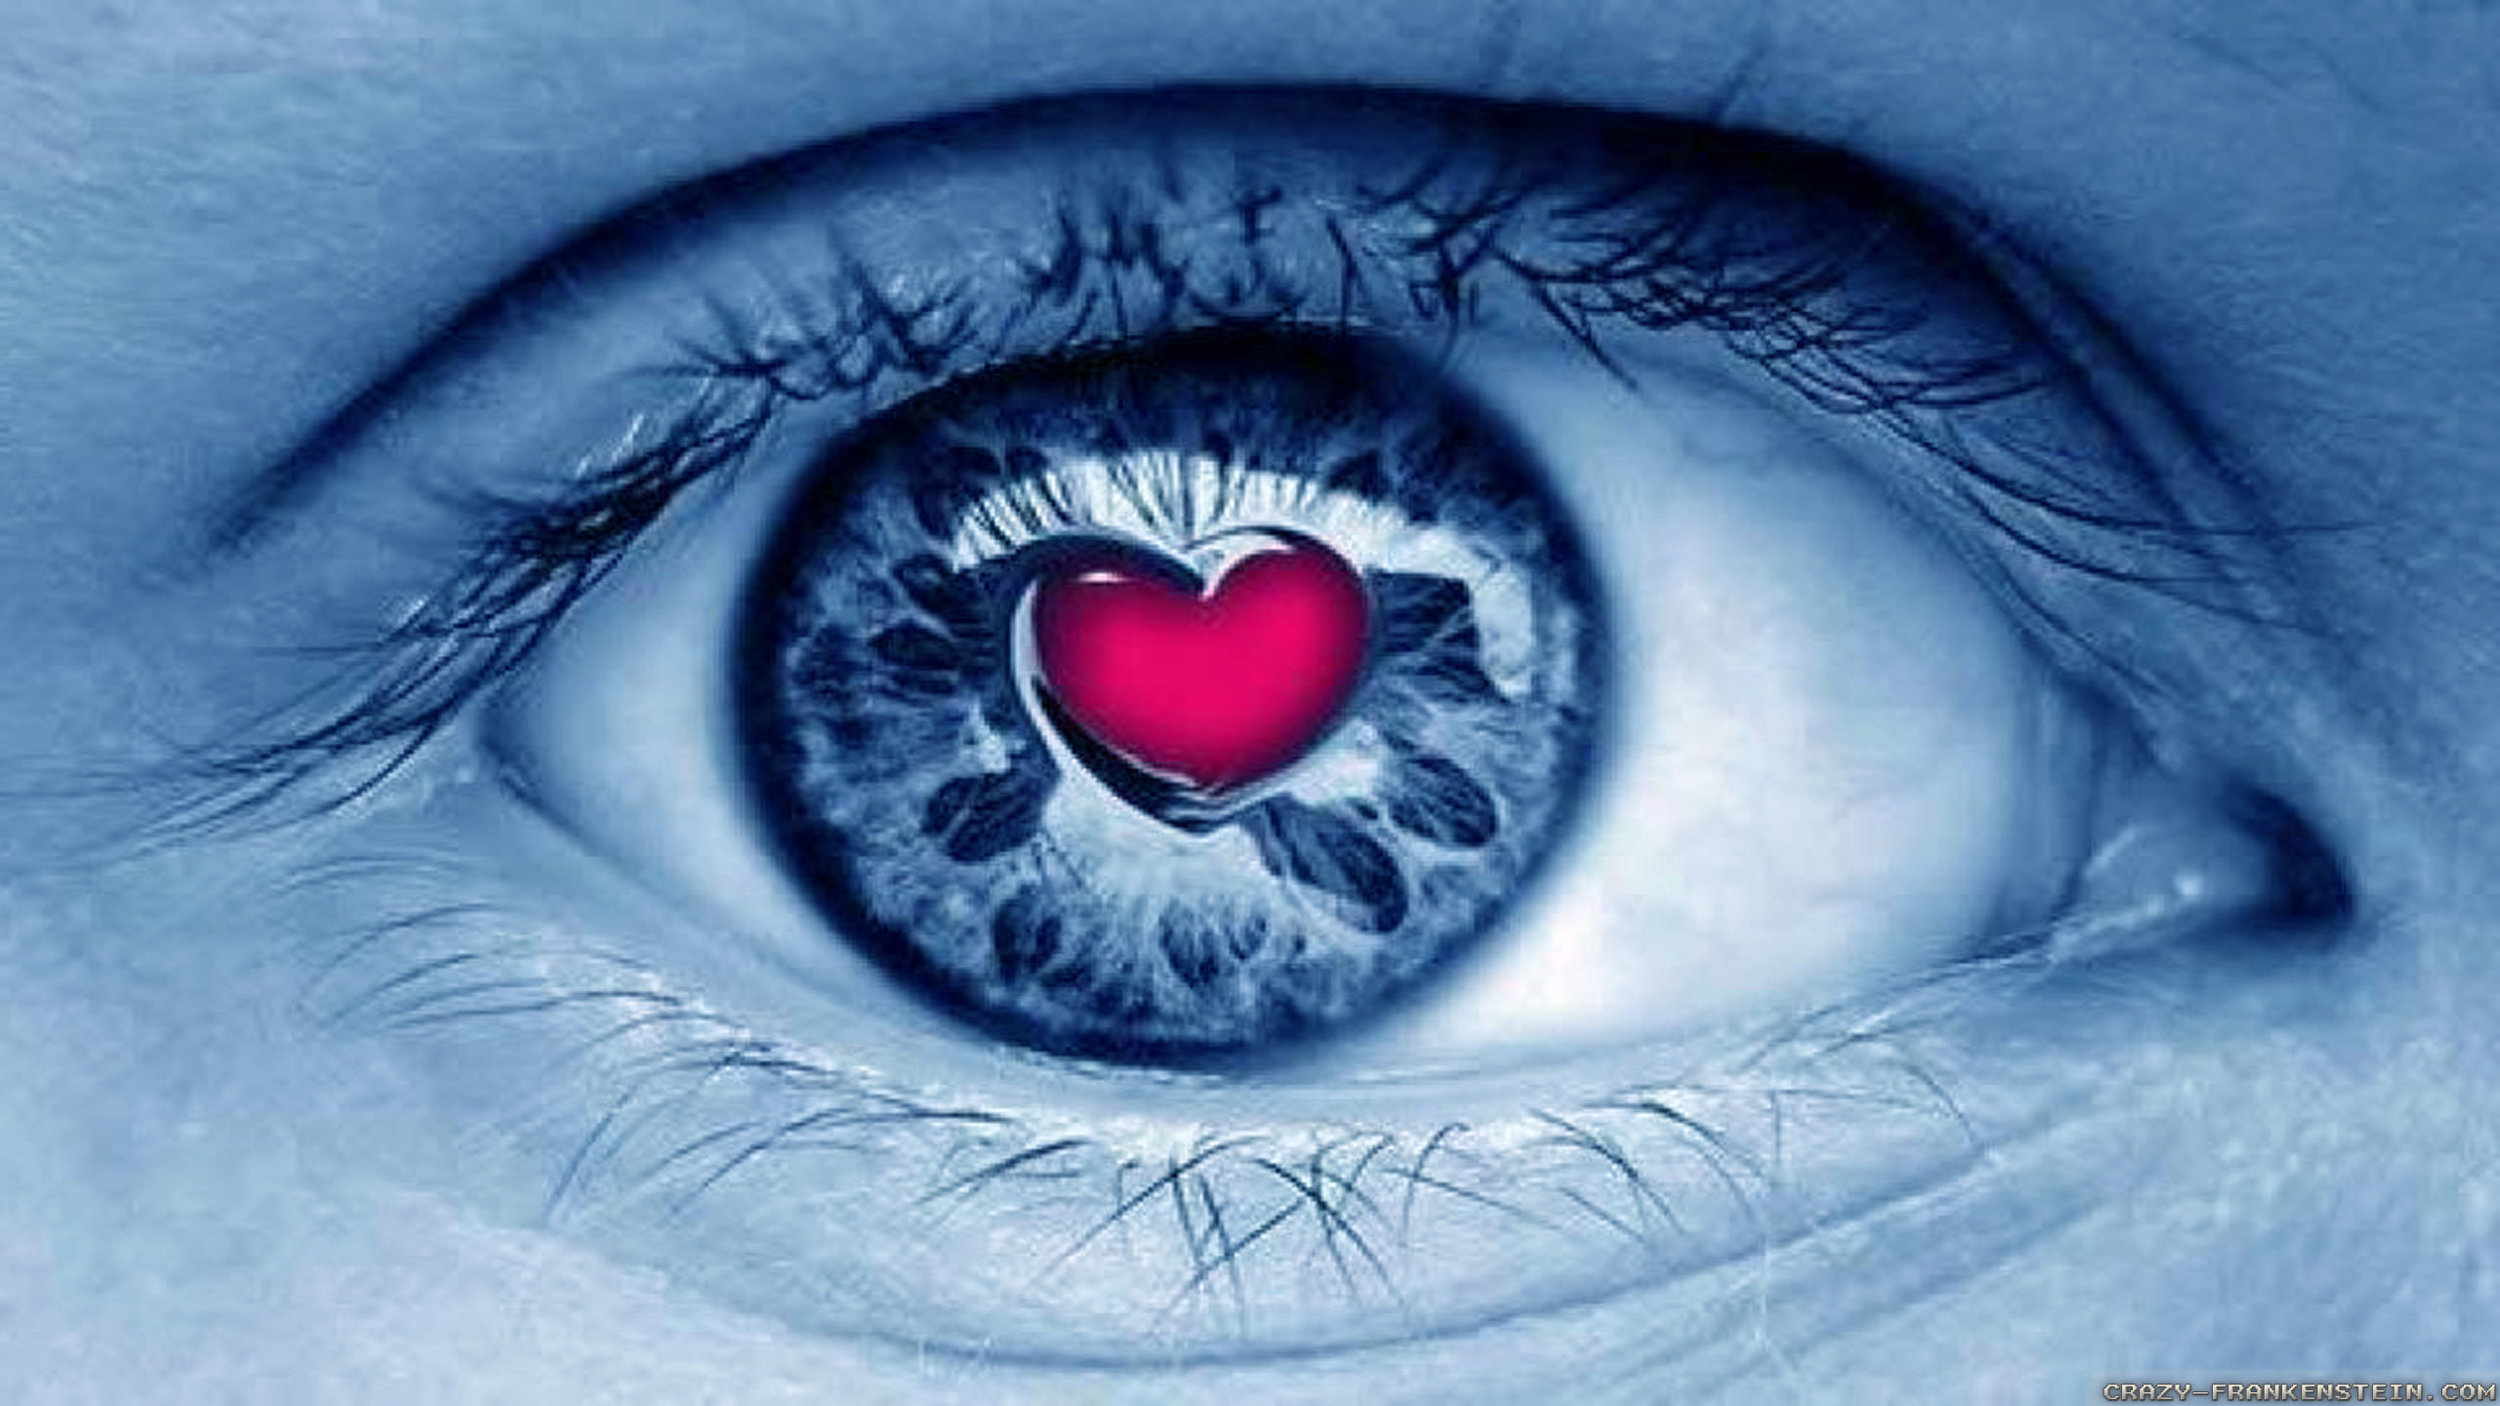 red-heart-love-eyes-wallpapers-2560x1440.jpg